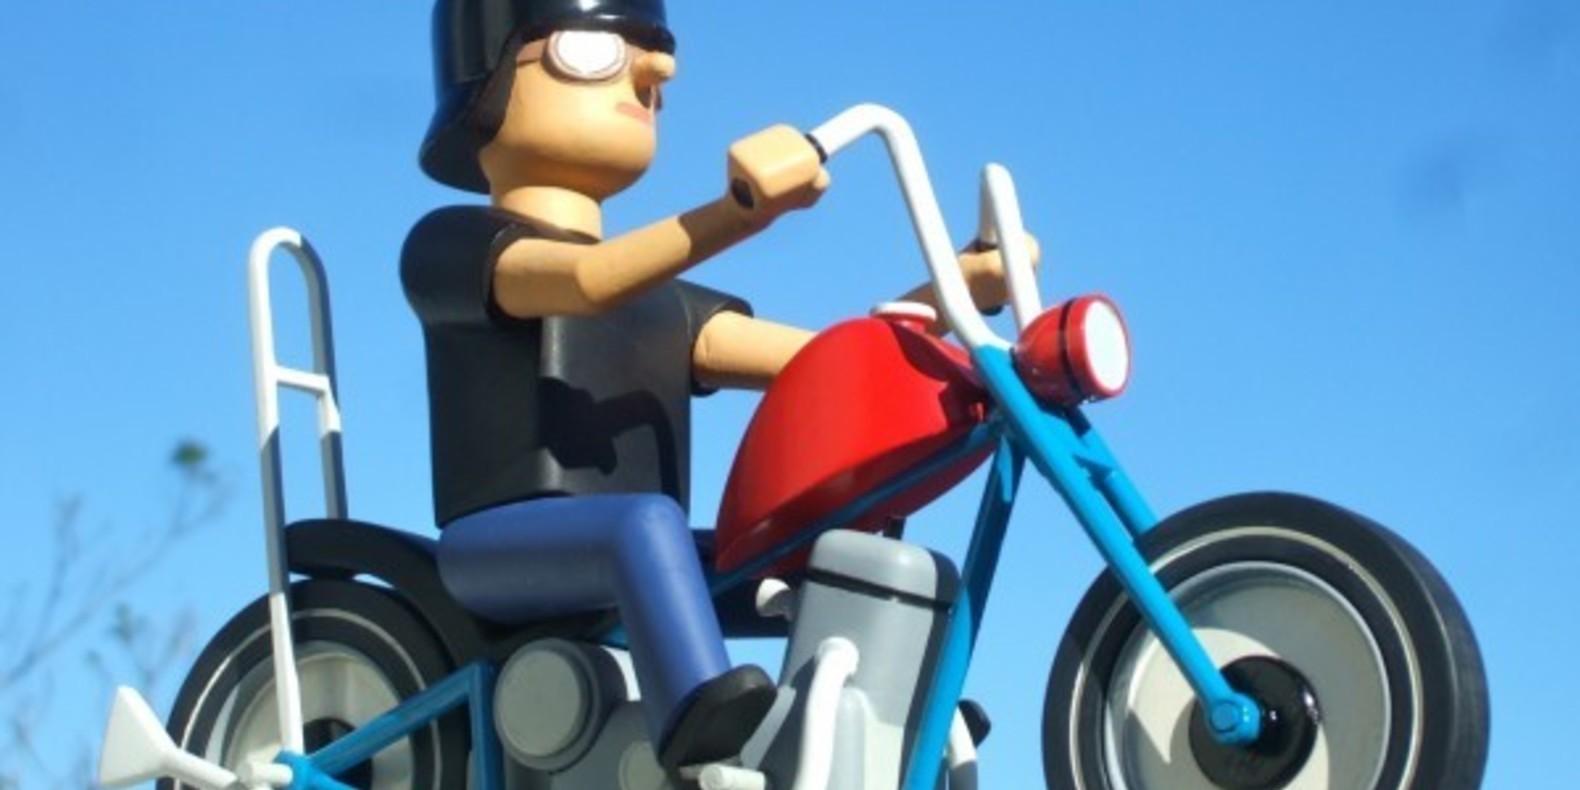 russell tate stay true motorcycle bike biker cults fichier 3D modèle 3D STL 3D printing 1